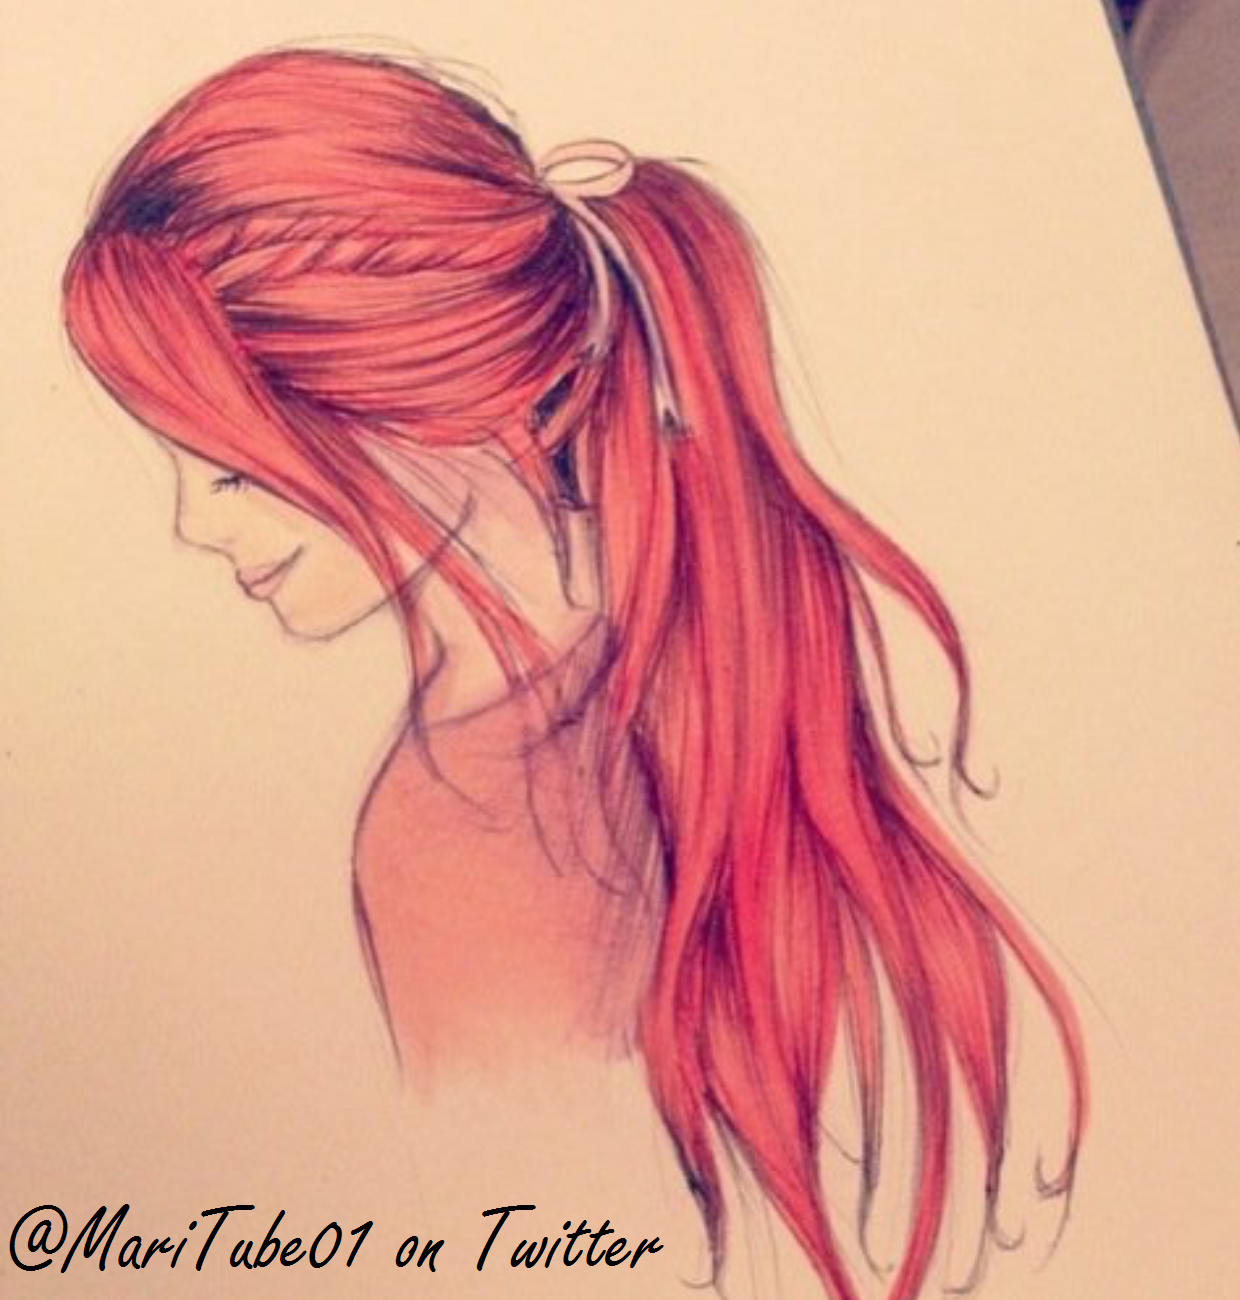 """Ribbon"" by @MariTube01"